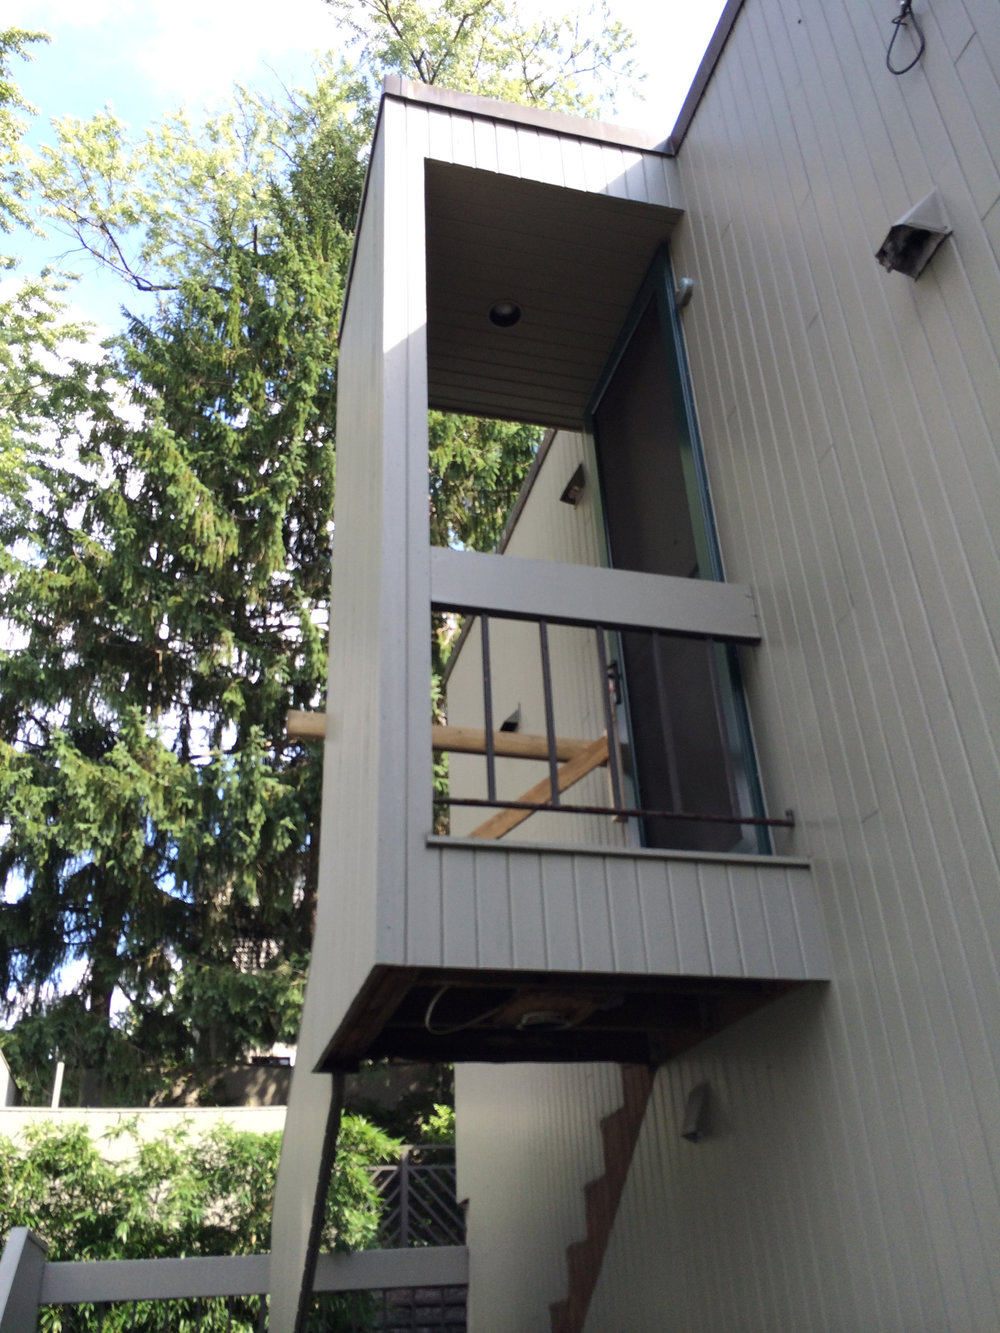 Scope Stair Renovation